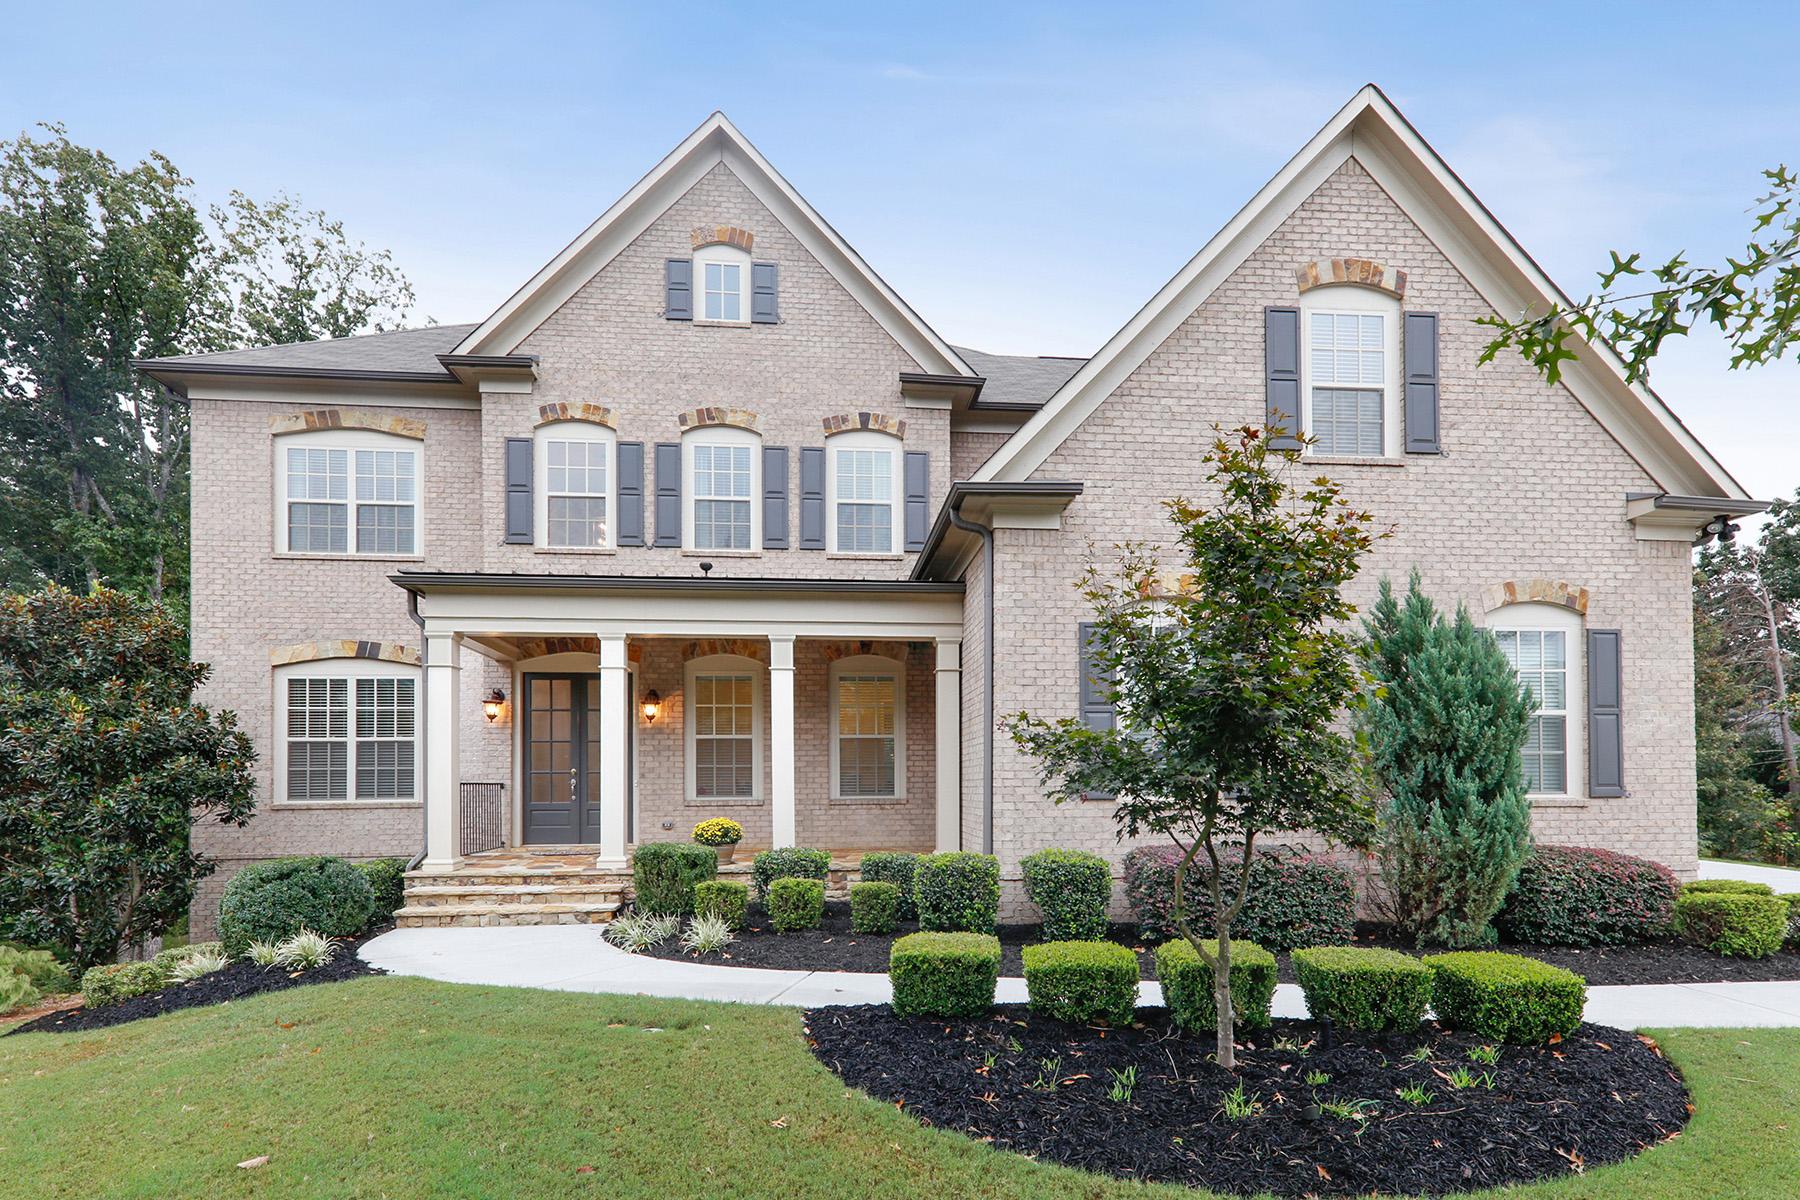 Single Family Homes for Sale at Beautiful Brick Executive Home on Private Cul-de-sac 1614 Newstone St, Lawrenceville, Georgia 30043 United States